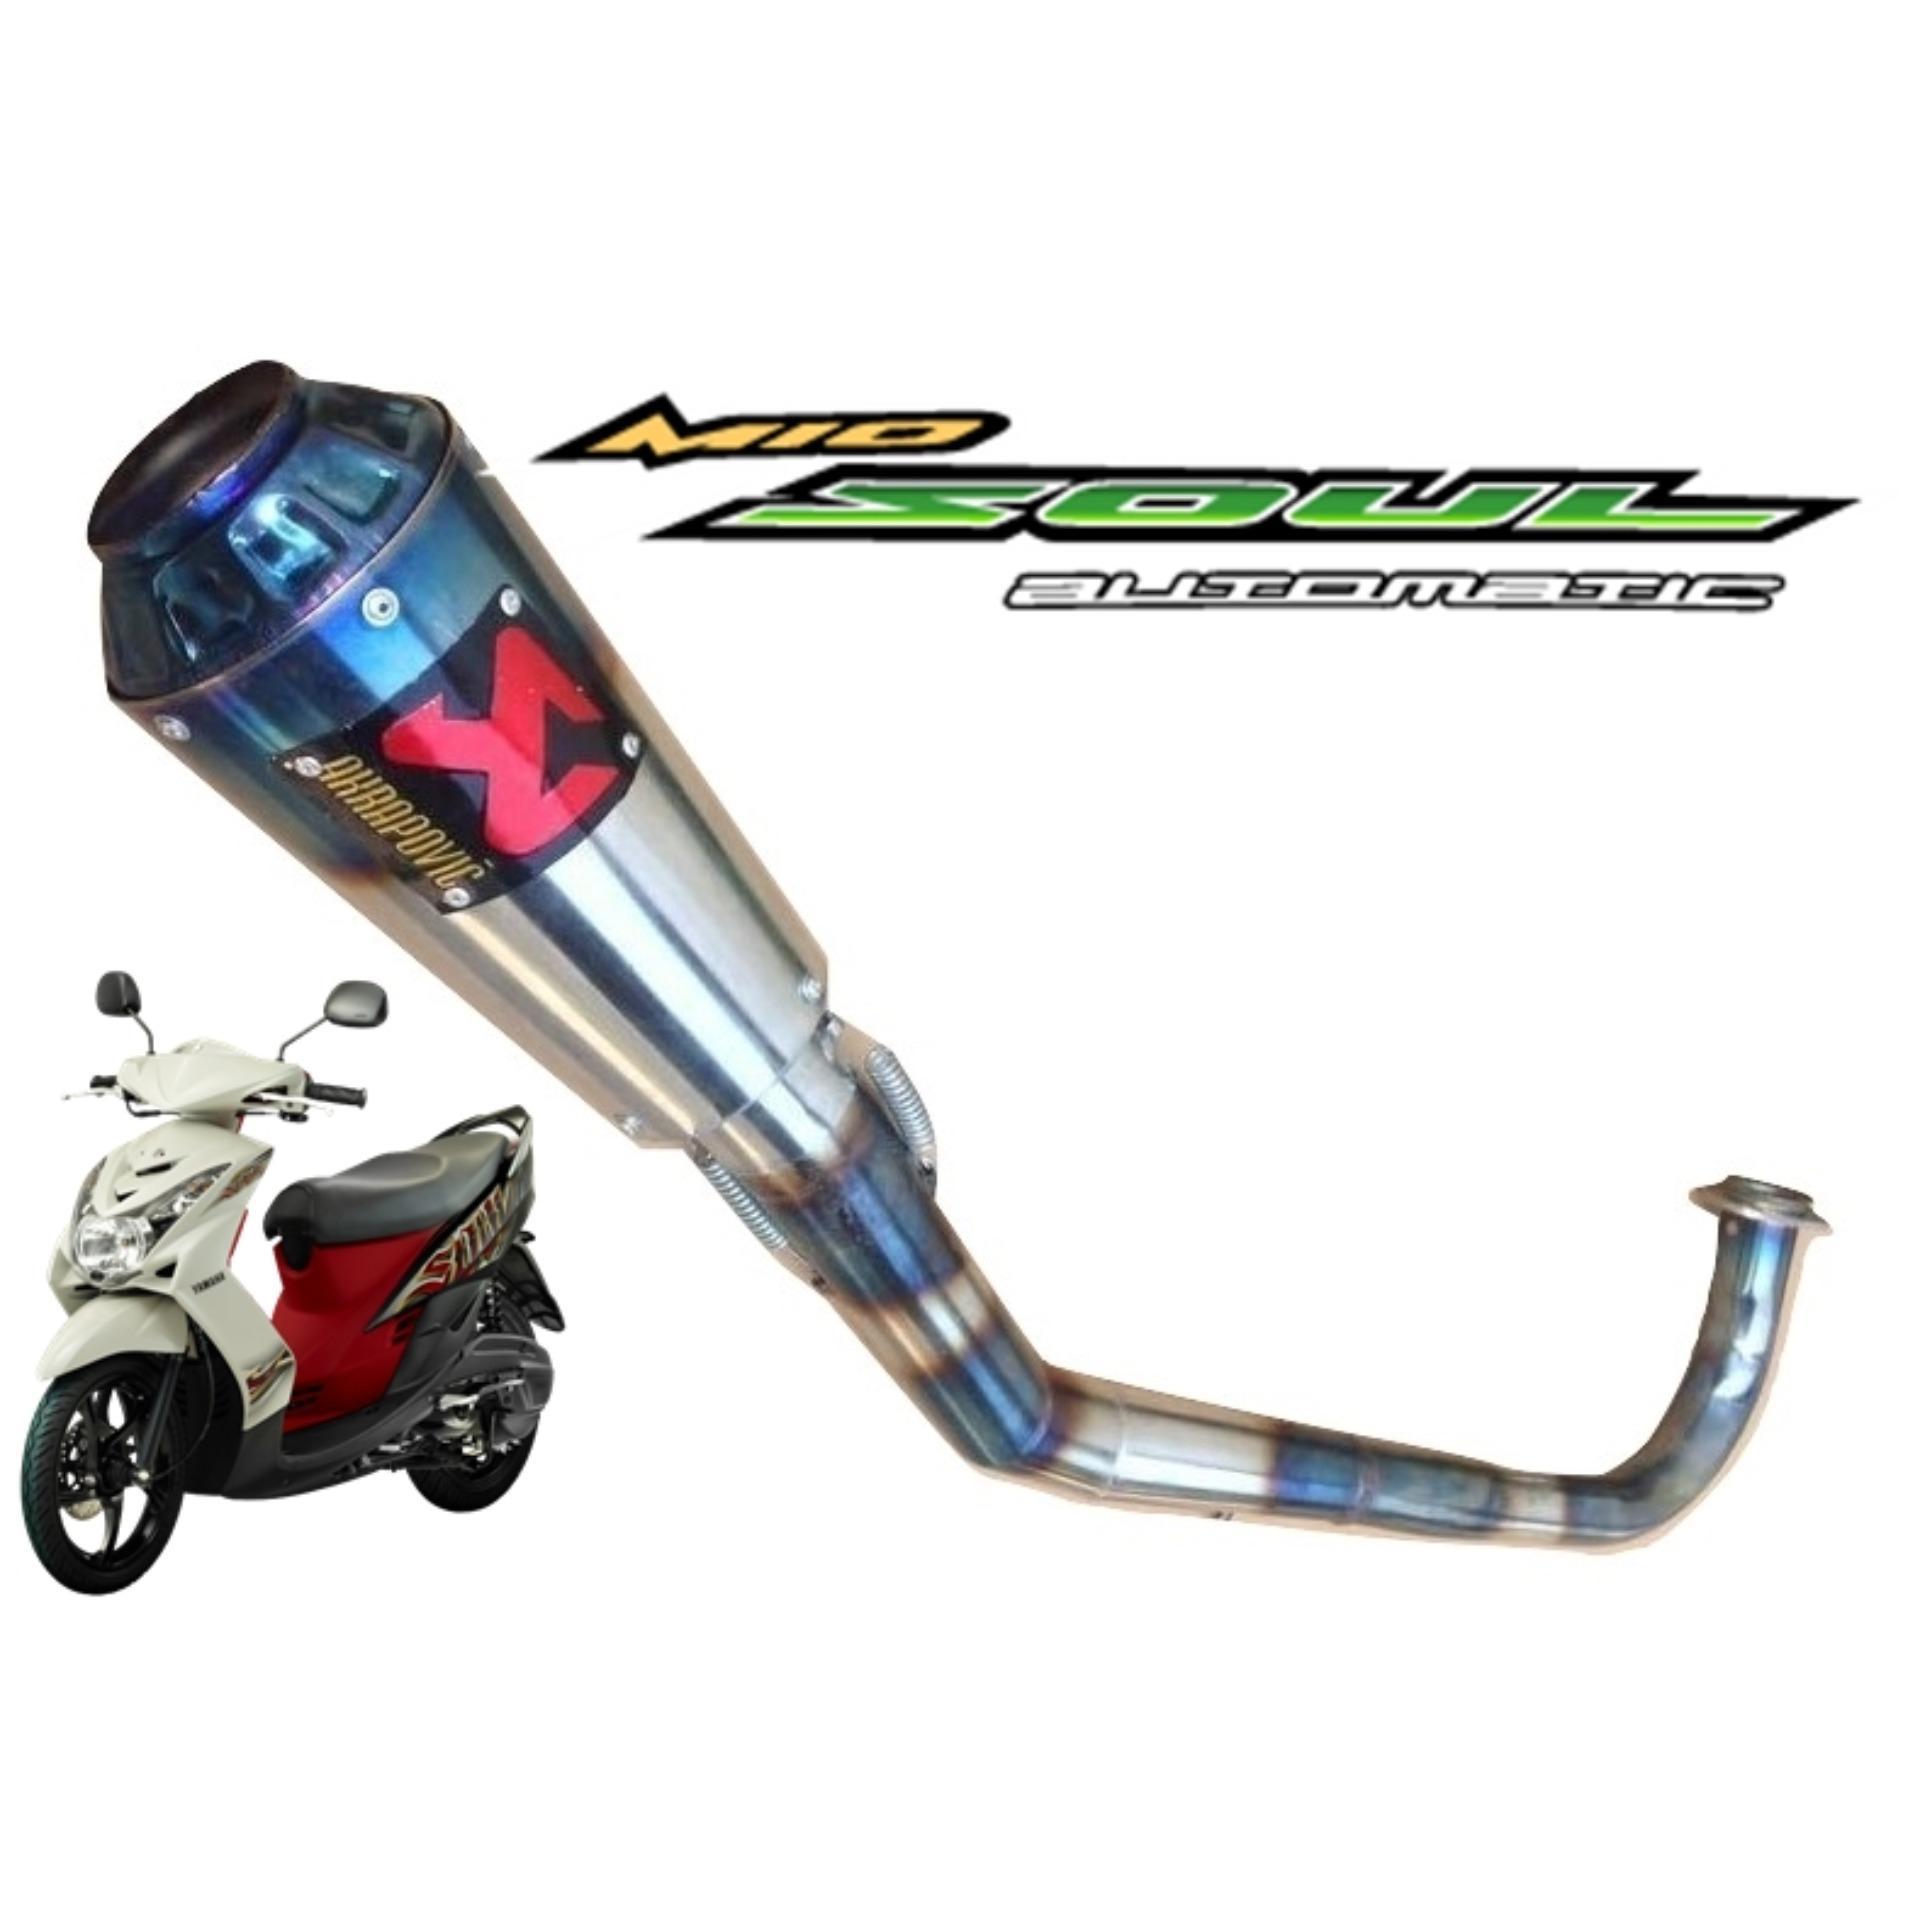 Jual Komponen Knalpot Emisi Kendaraan Lazada R9 Assen Yamaha Scorpio Full System Motor Mio Soul Akrapovic Bluemoon